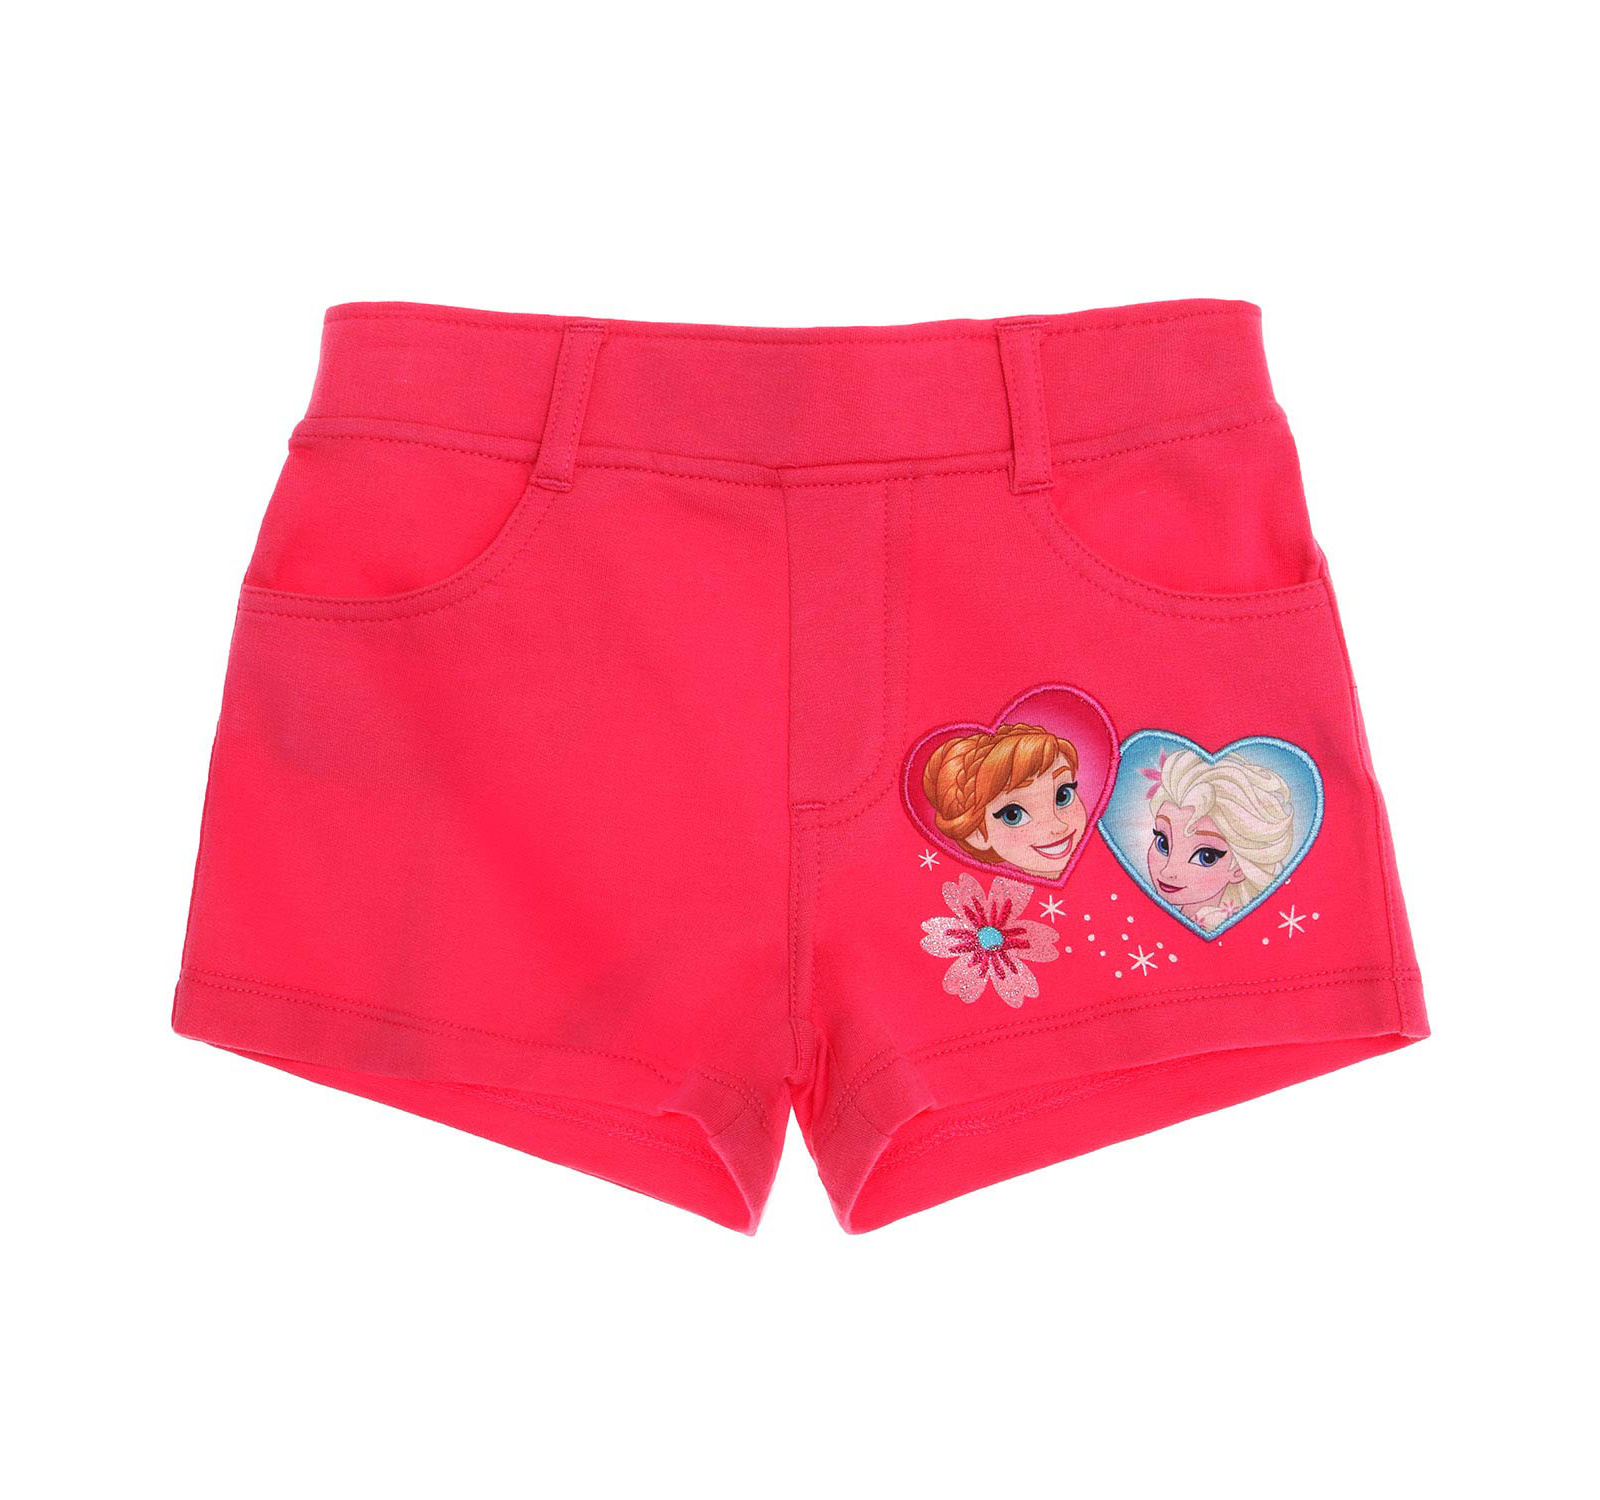 pantaloni scurti trening femei